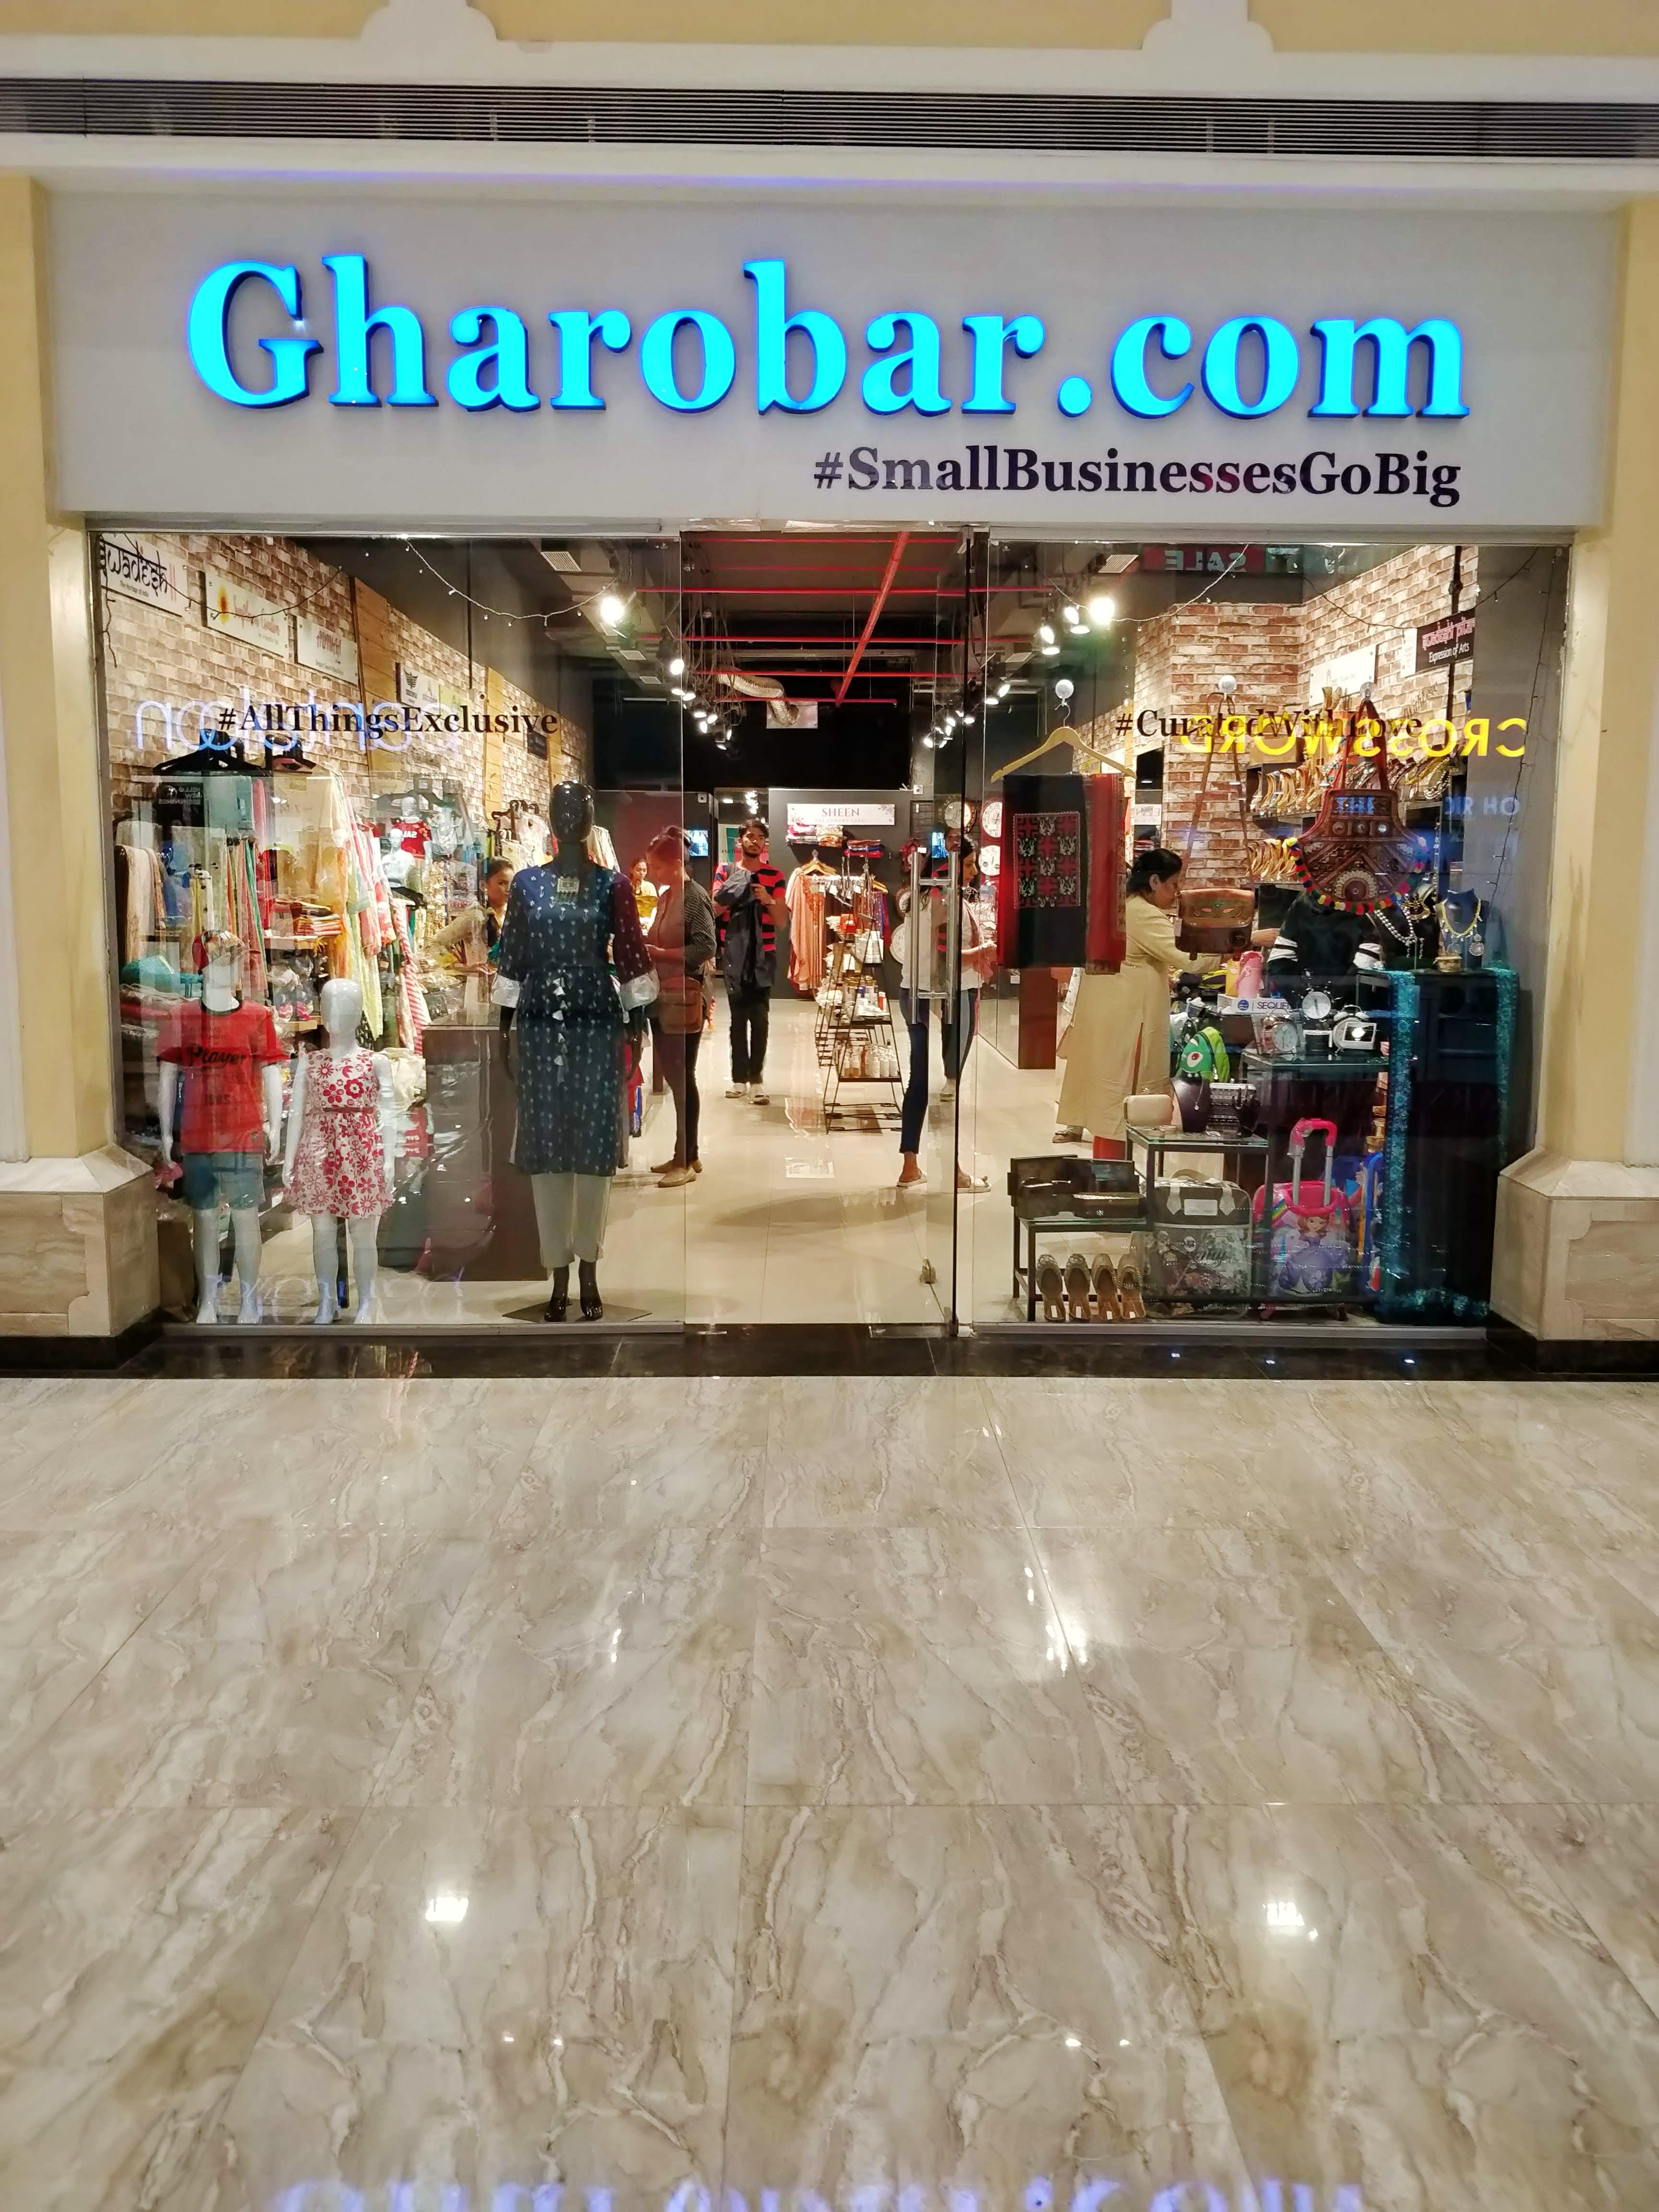 image - Gharobar